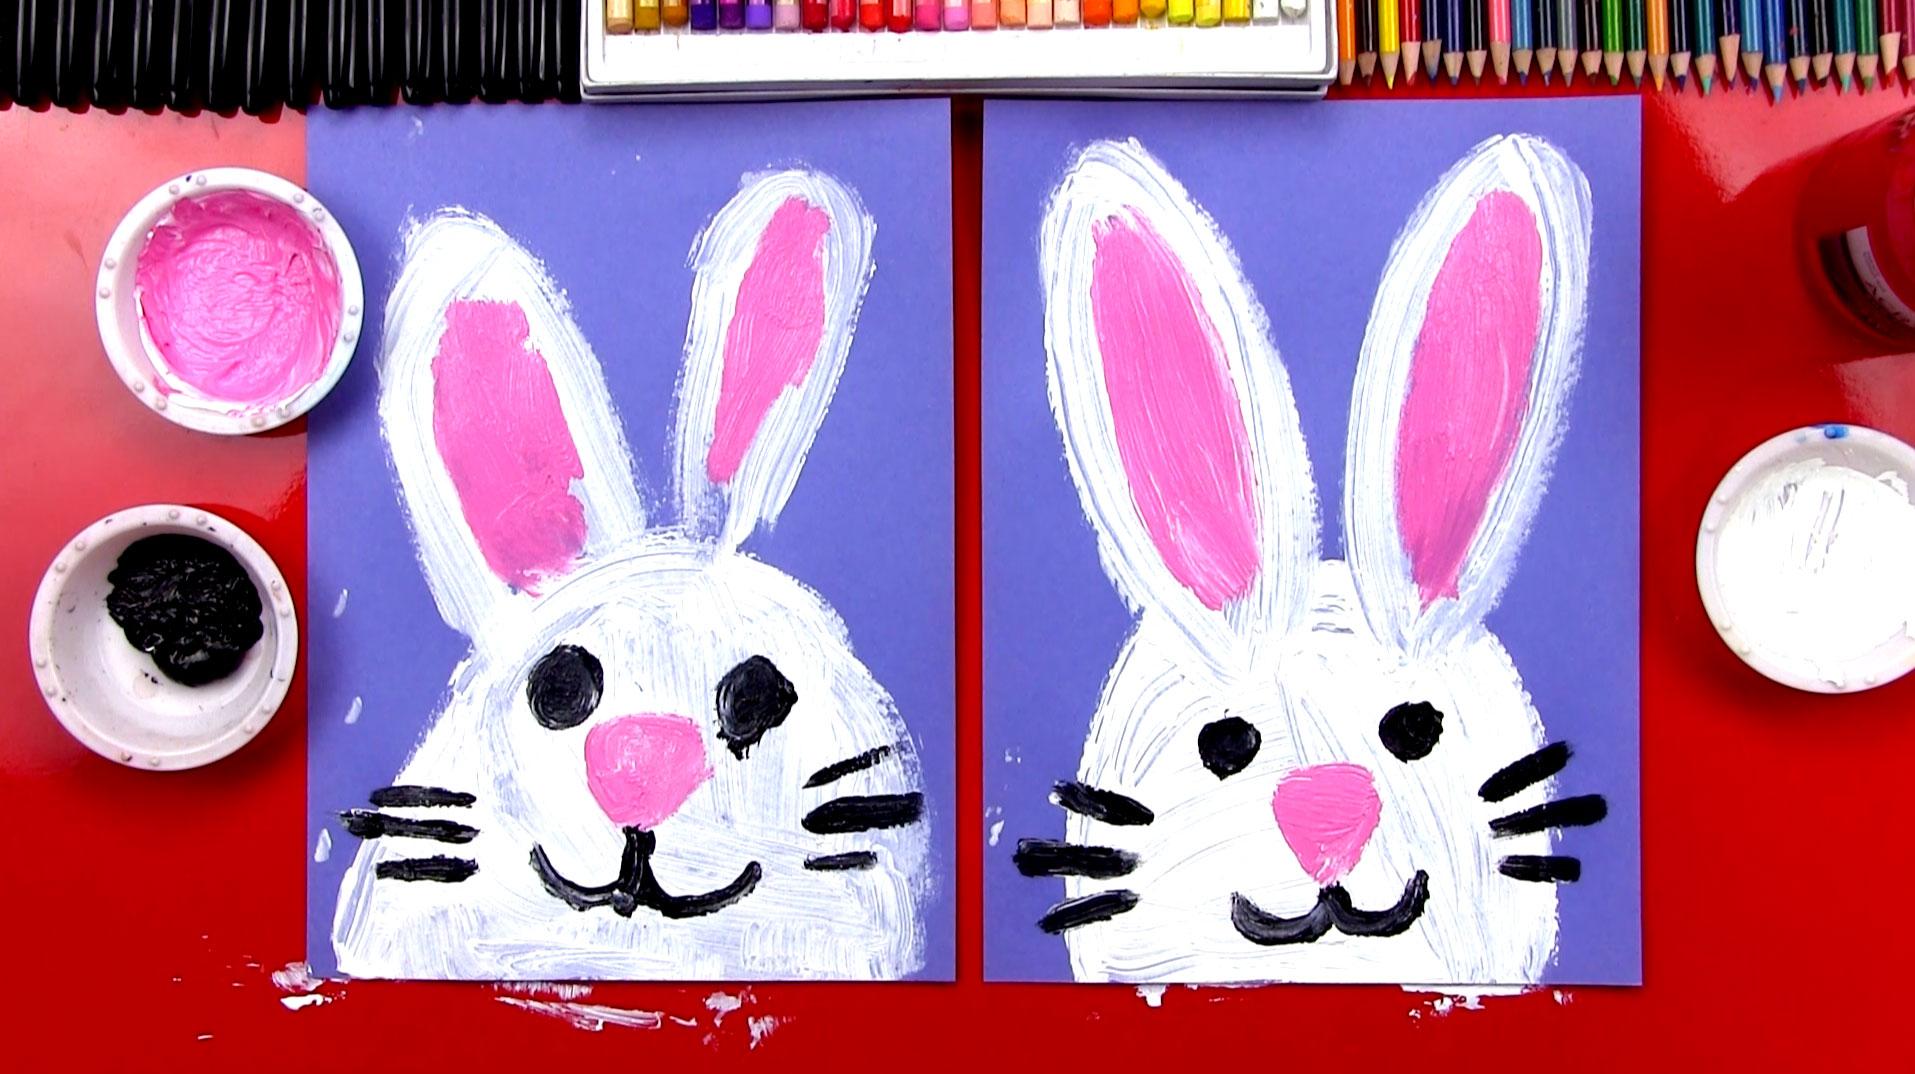 Drawn rabbit art for kid hub An Easter Hub Art Kids